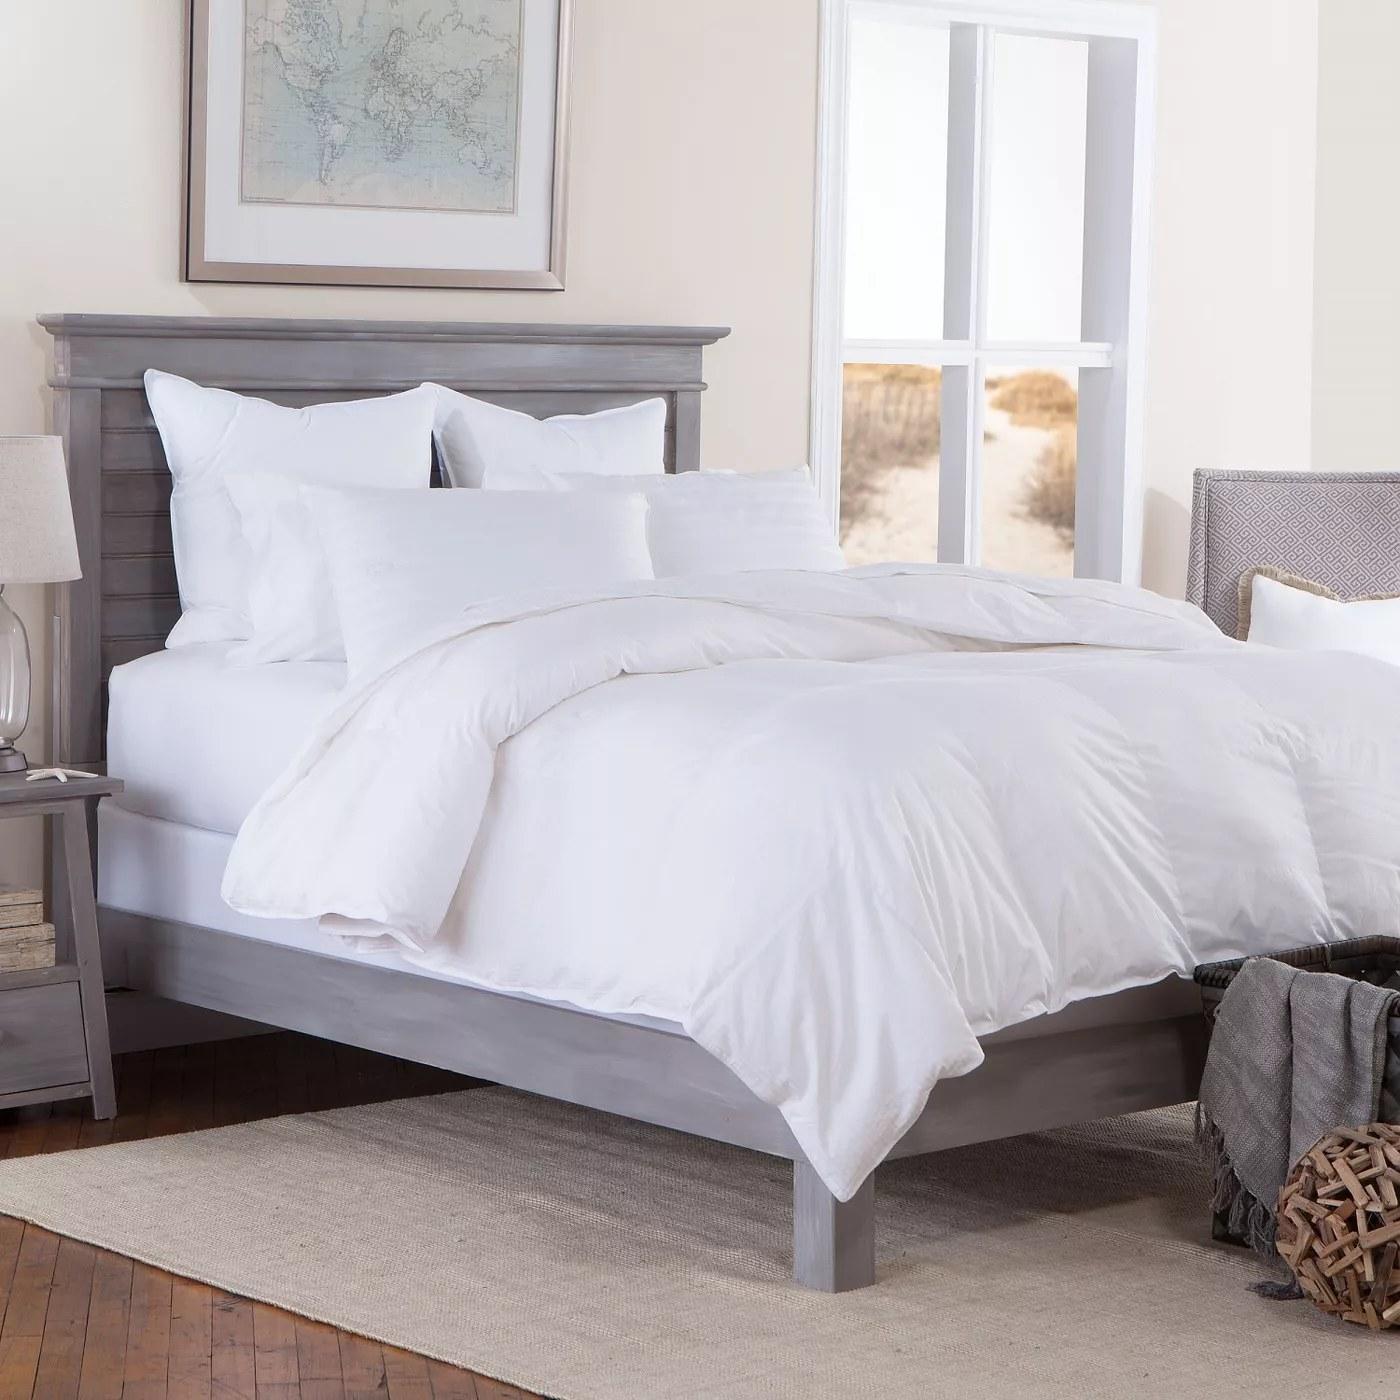 A white comforter